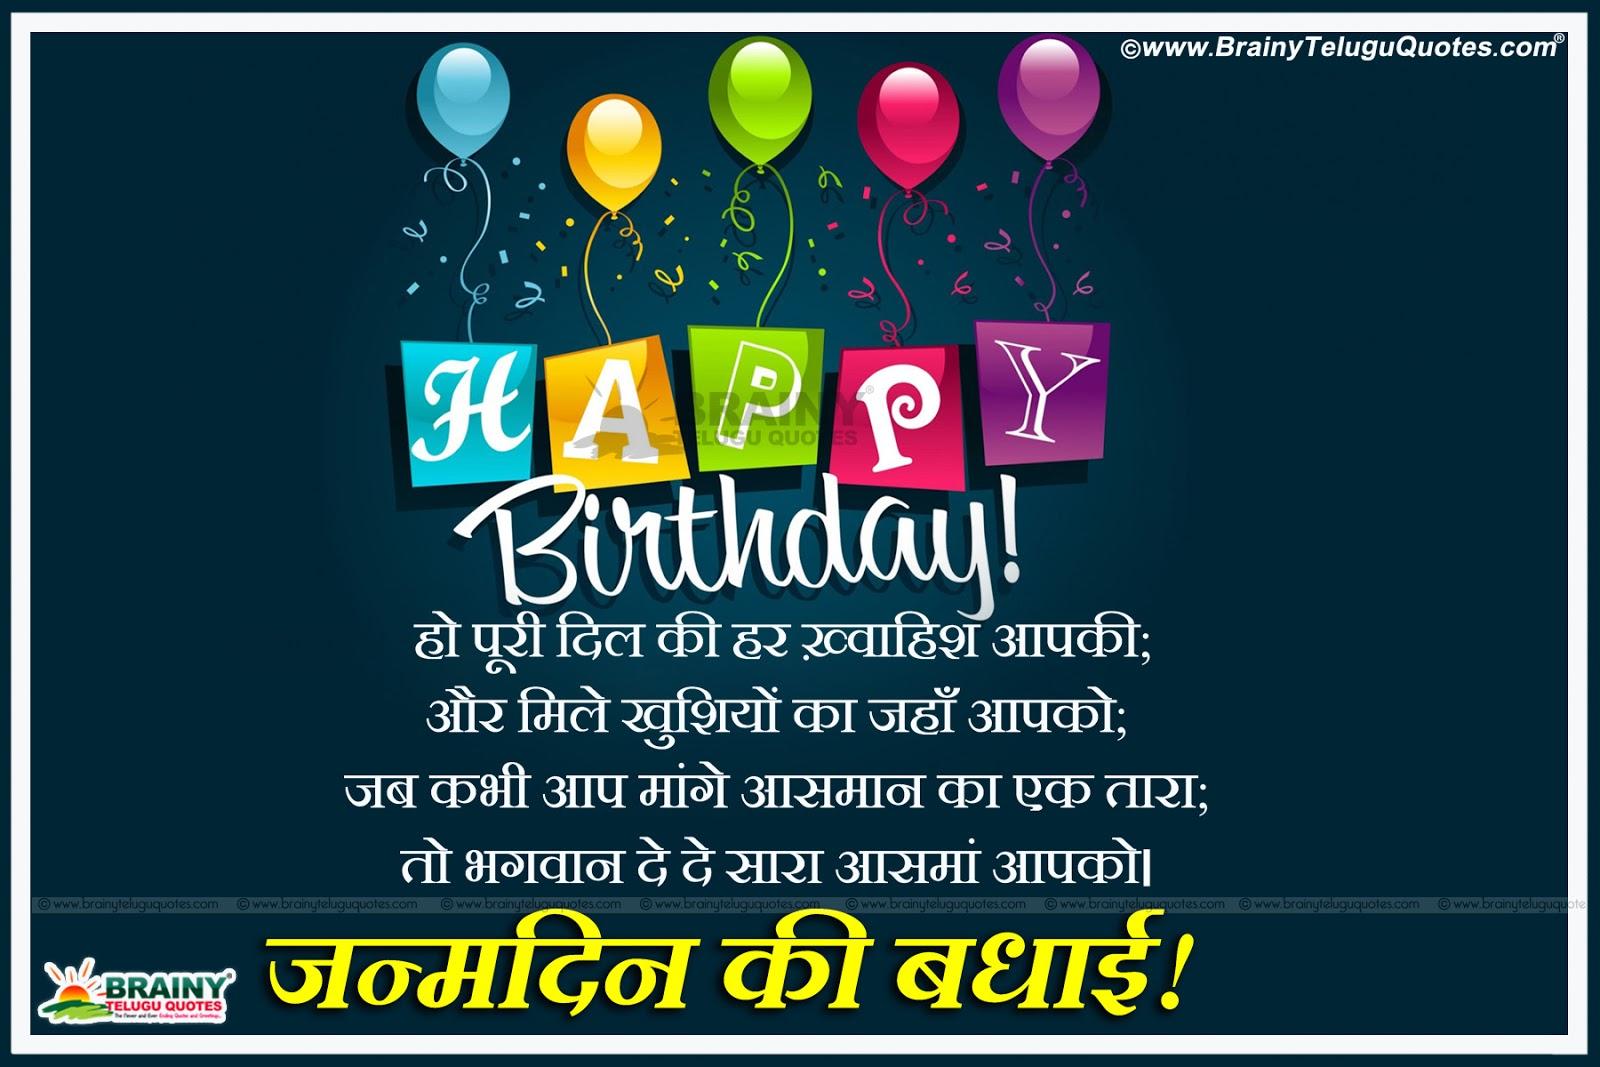 Birthday Wishes In Hindi Pictures Shayari Greetings